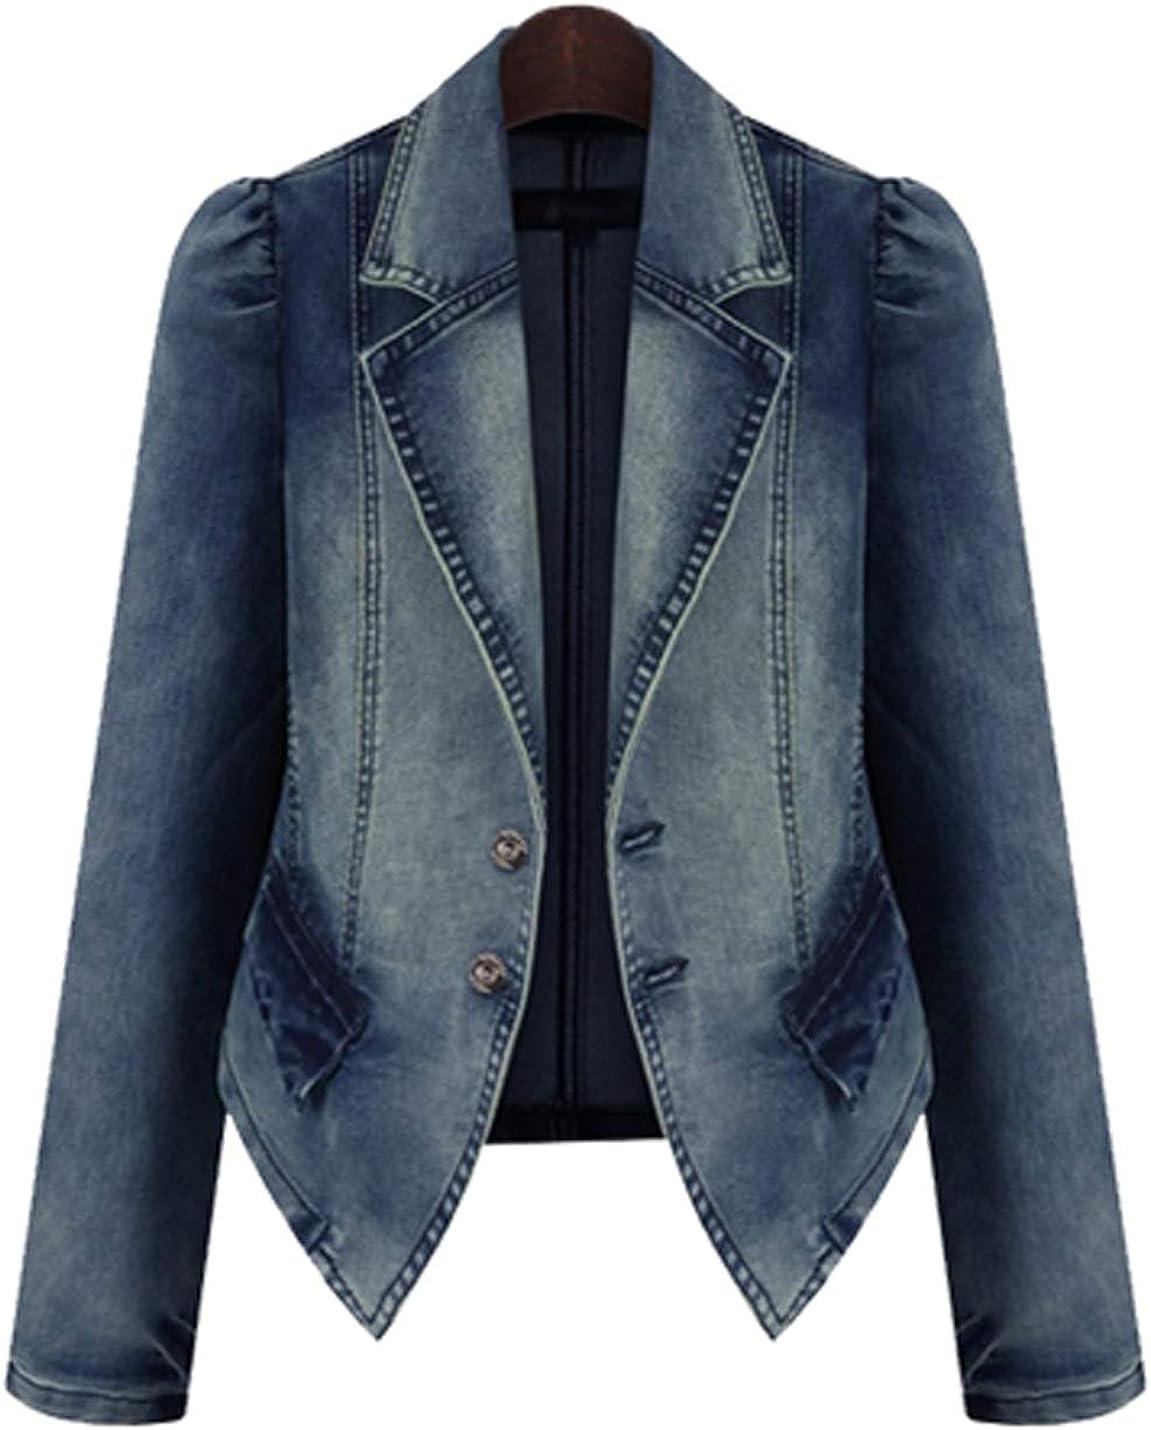 D.B.M Women's Short Slim Puff Sleeve Irregular Hem Denim Cotton Suit Jacket